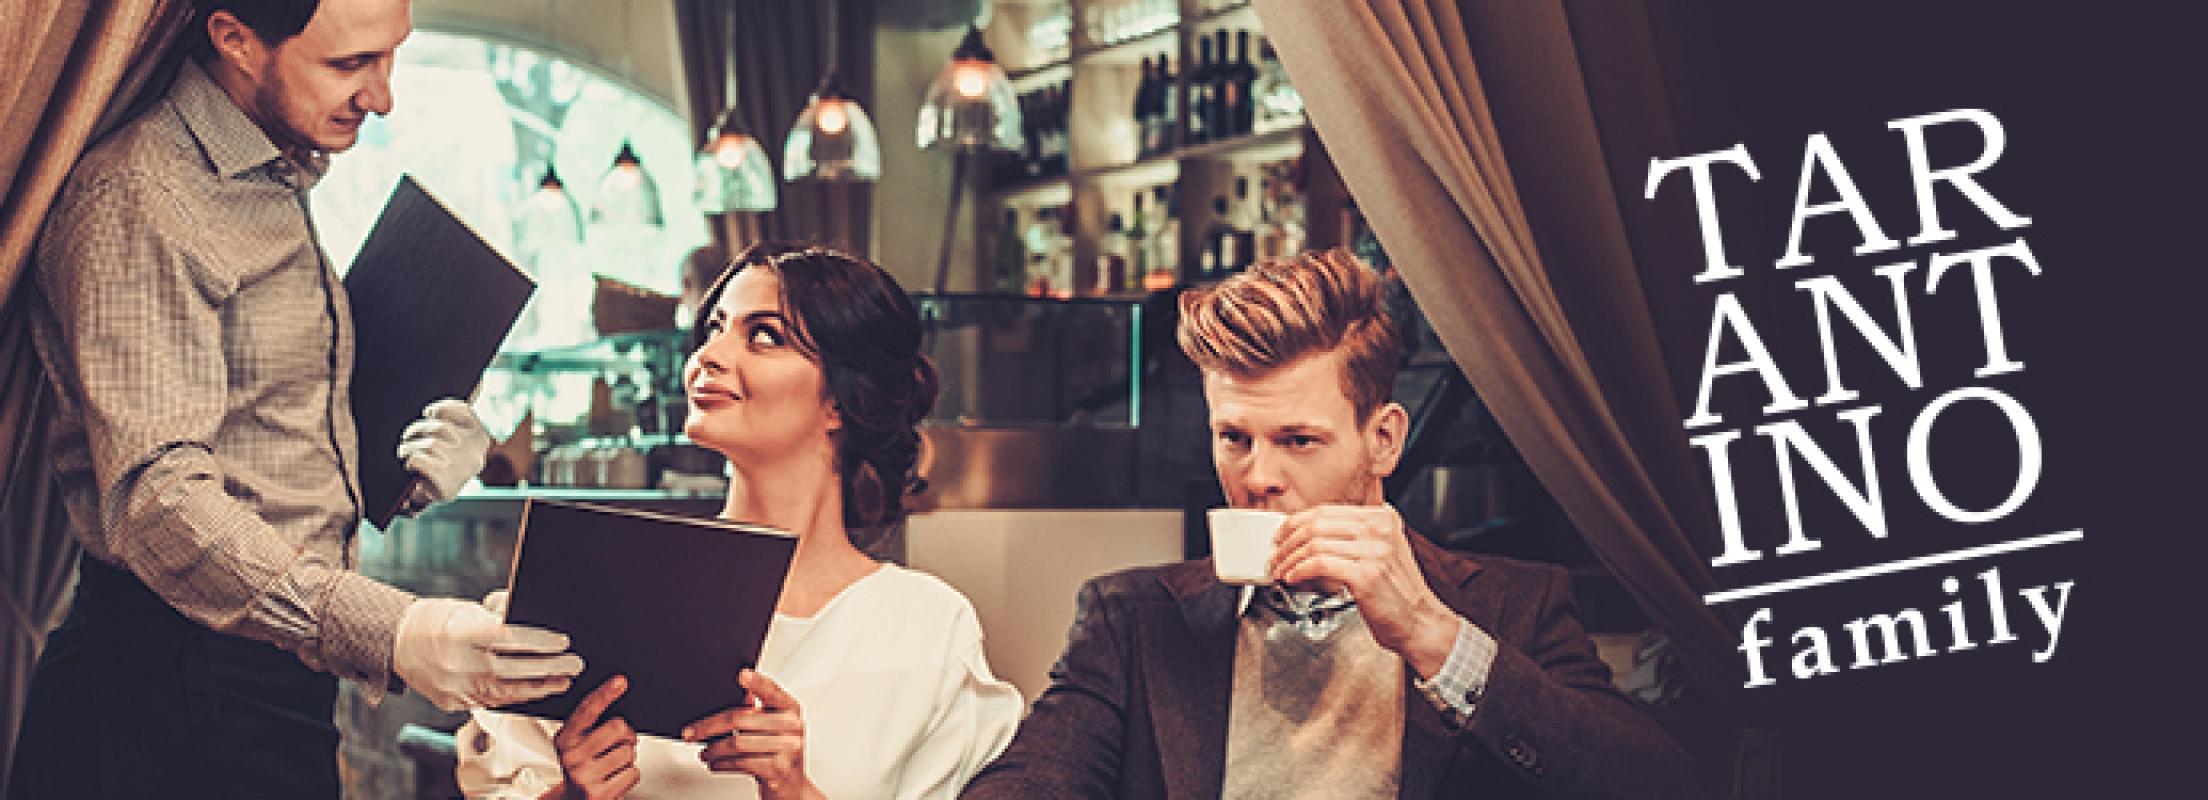 Ресторан-пивоварня SYNDICATE BEER&GRILL и БАКЛАЖАН приглашает на работу хостесс